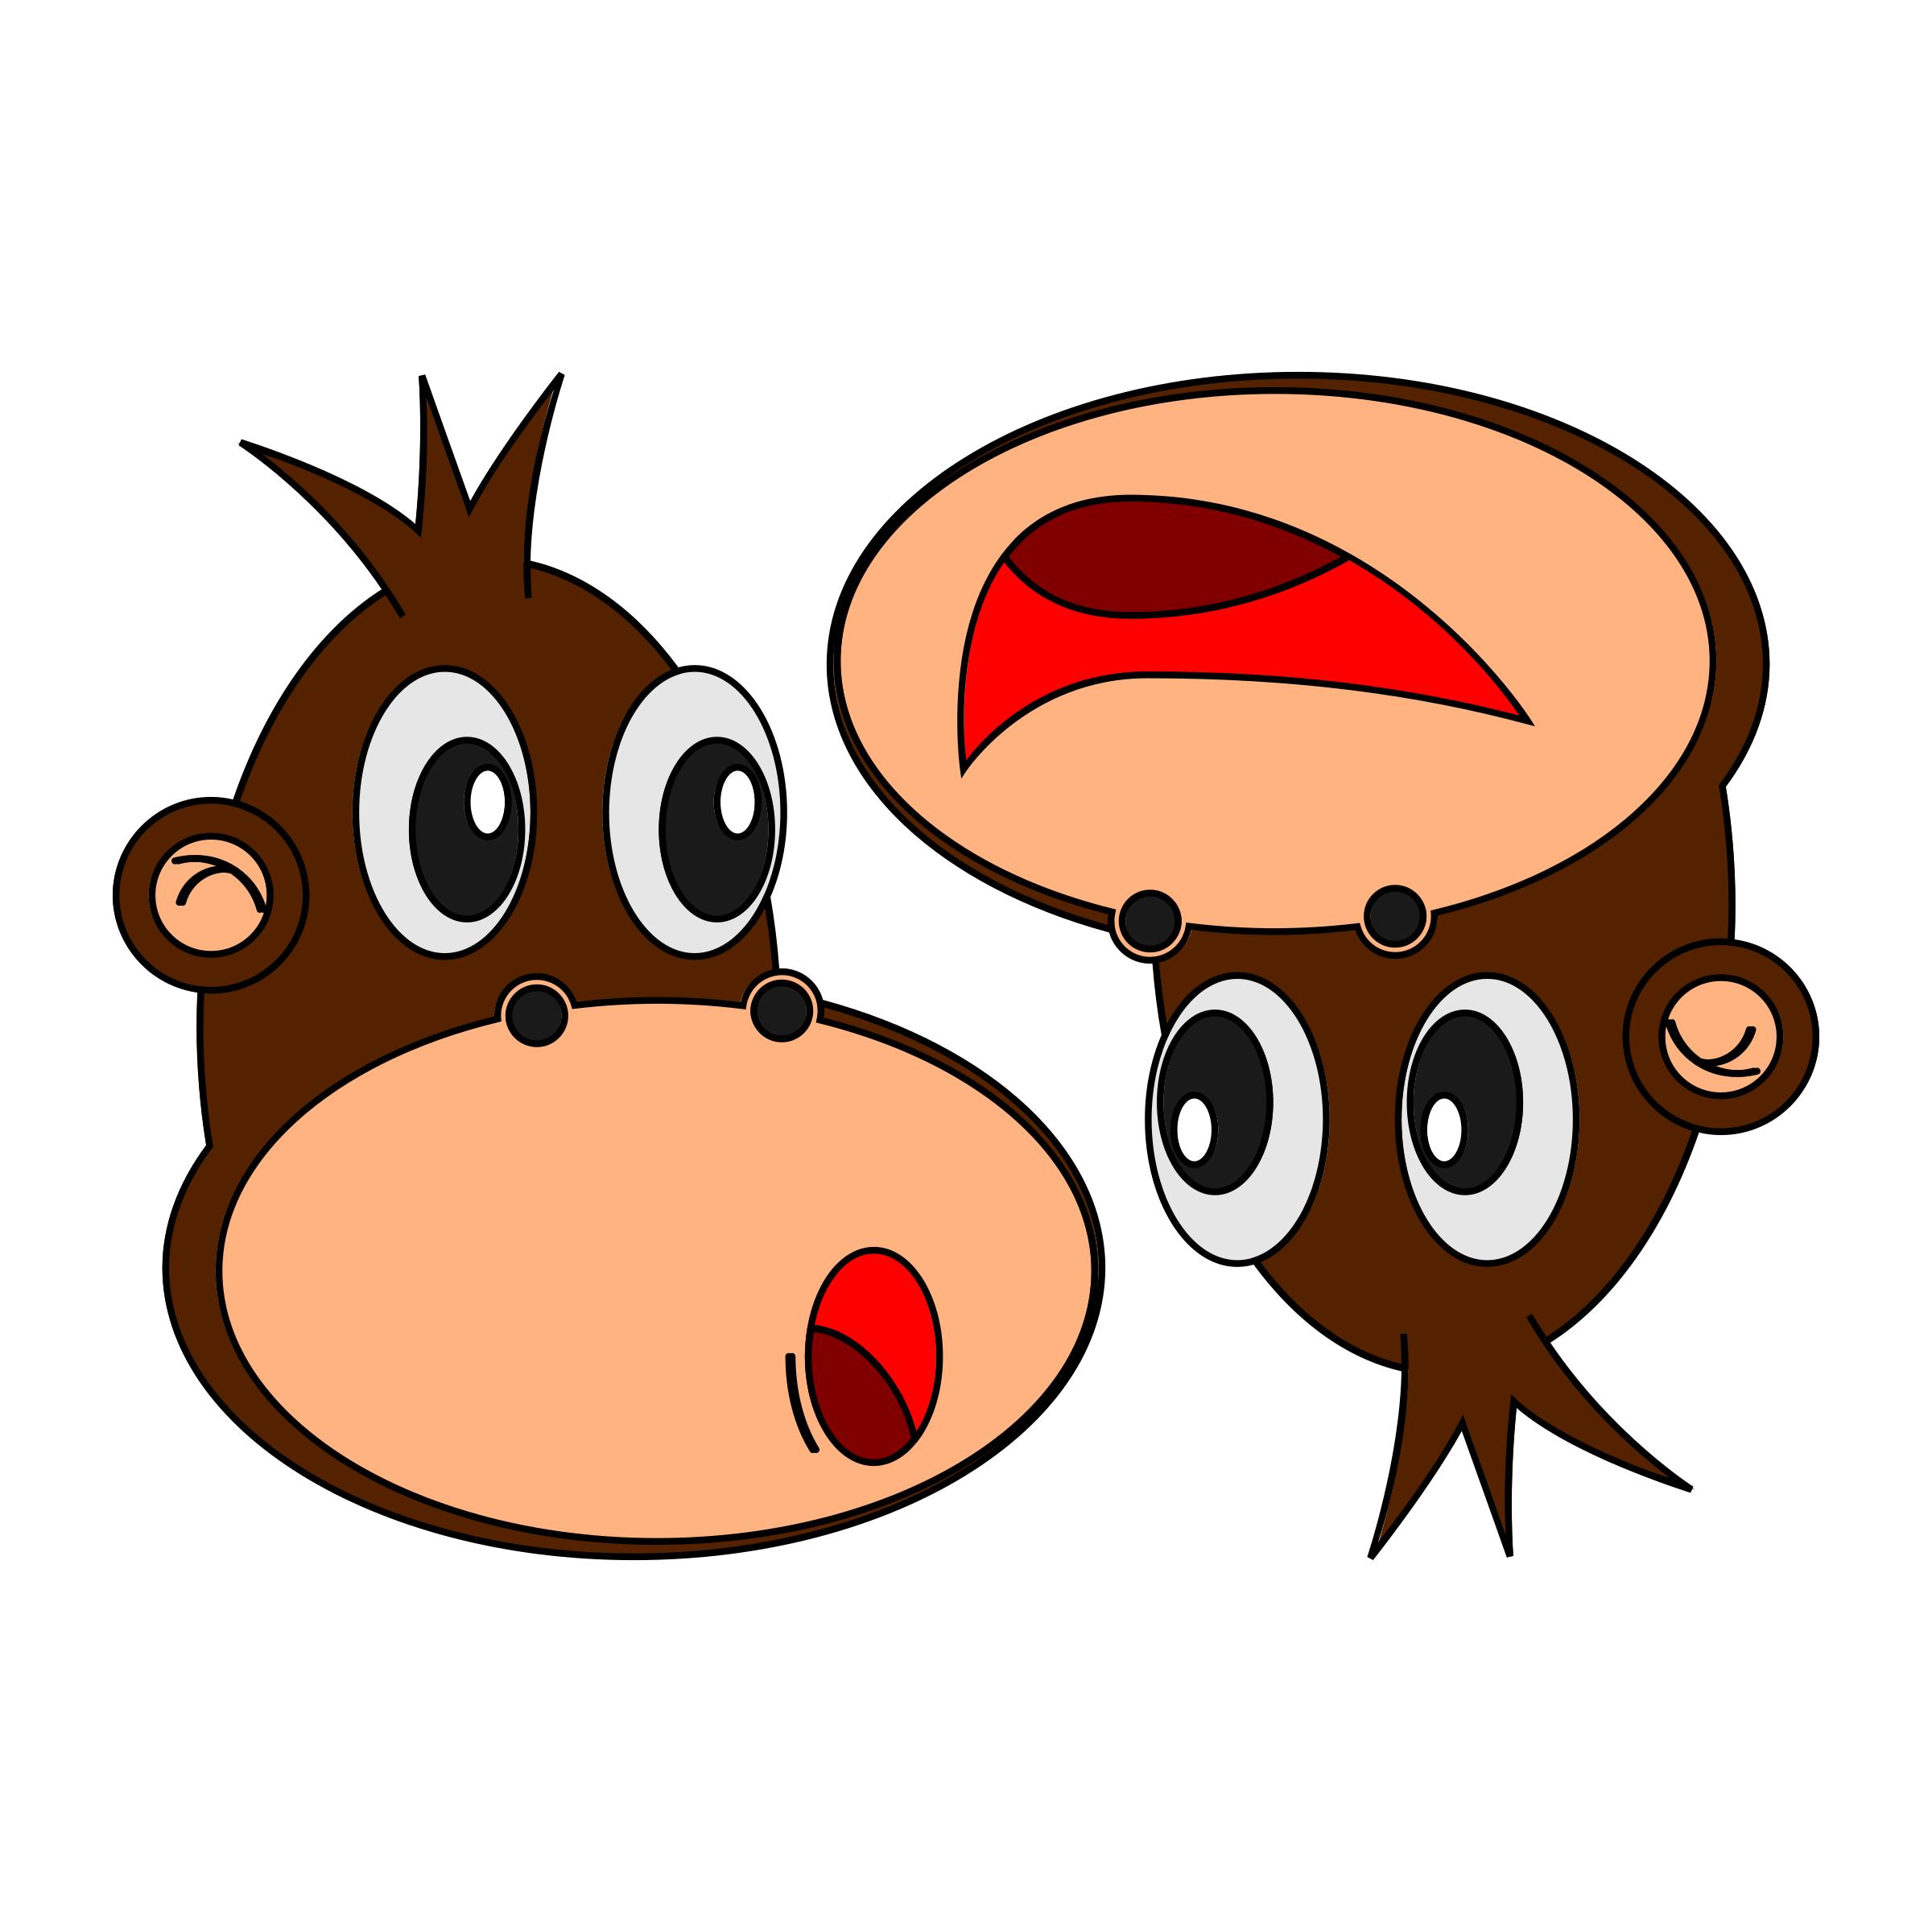 Monkey Expressions by belthsazar_liem